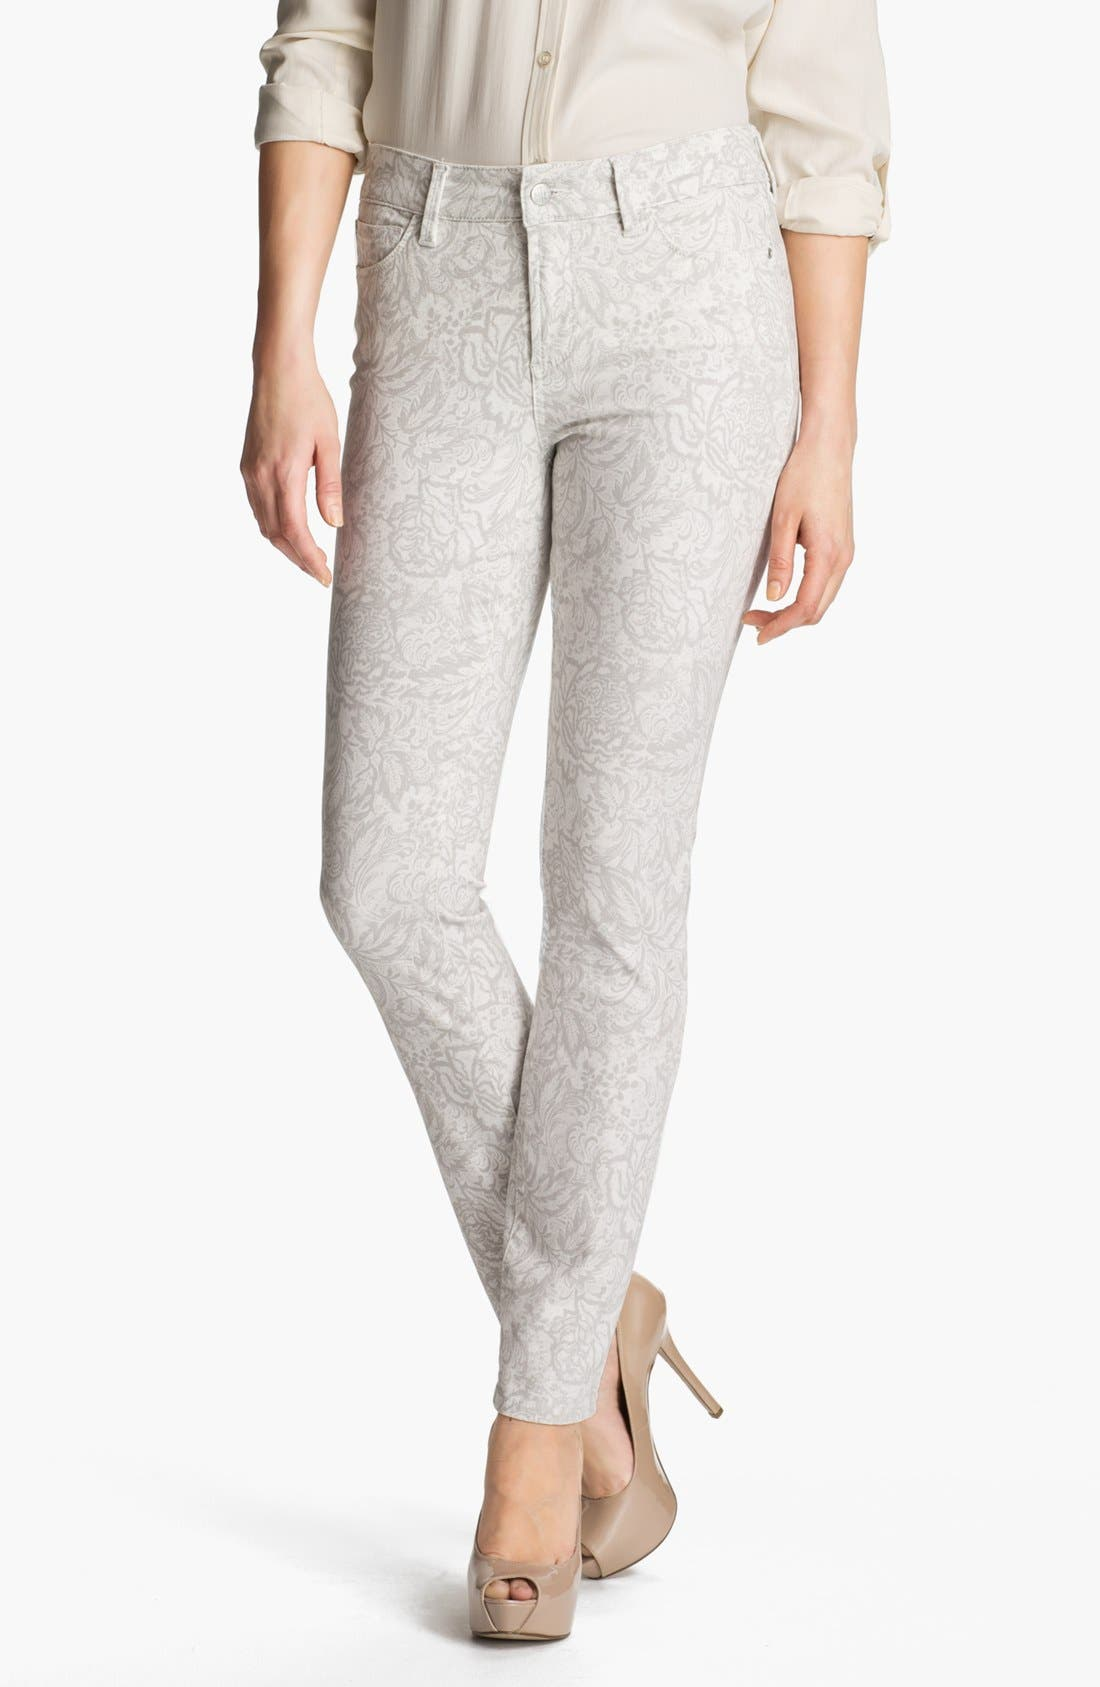 Main Image - NYDJ 'Alisha' Print Skinny Stretch Ankle Jeans (Petite)